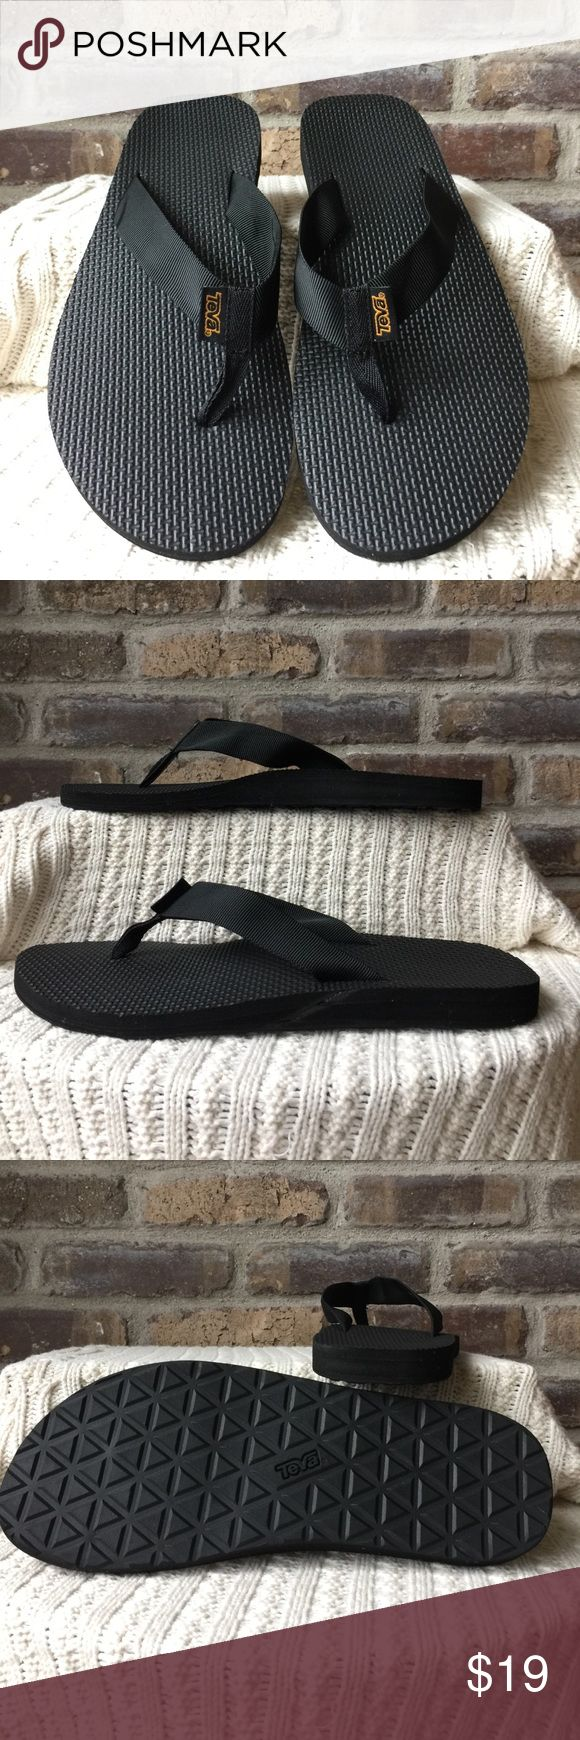 Teva flip-flops Women's size 10 black like new condition Teva flip-flops Teva Shoes Sandals & Flip-Flops